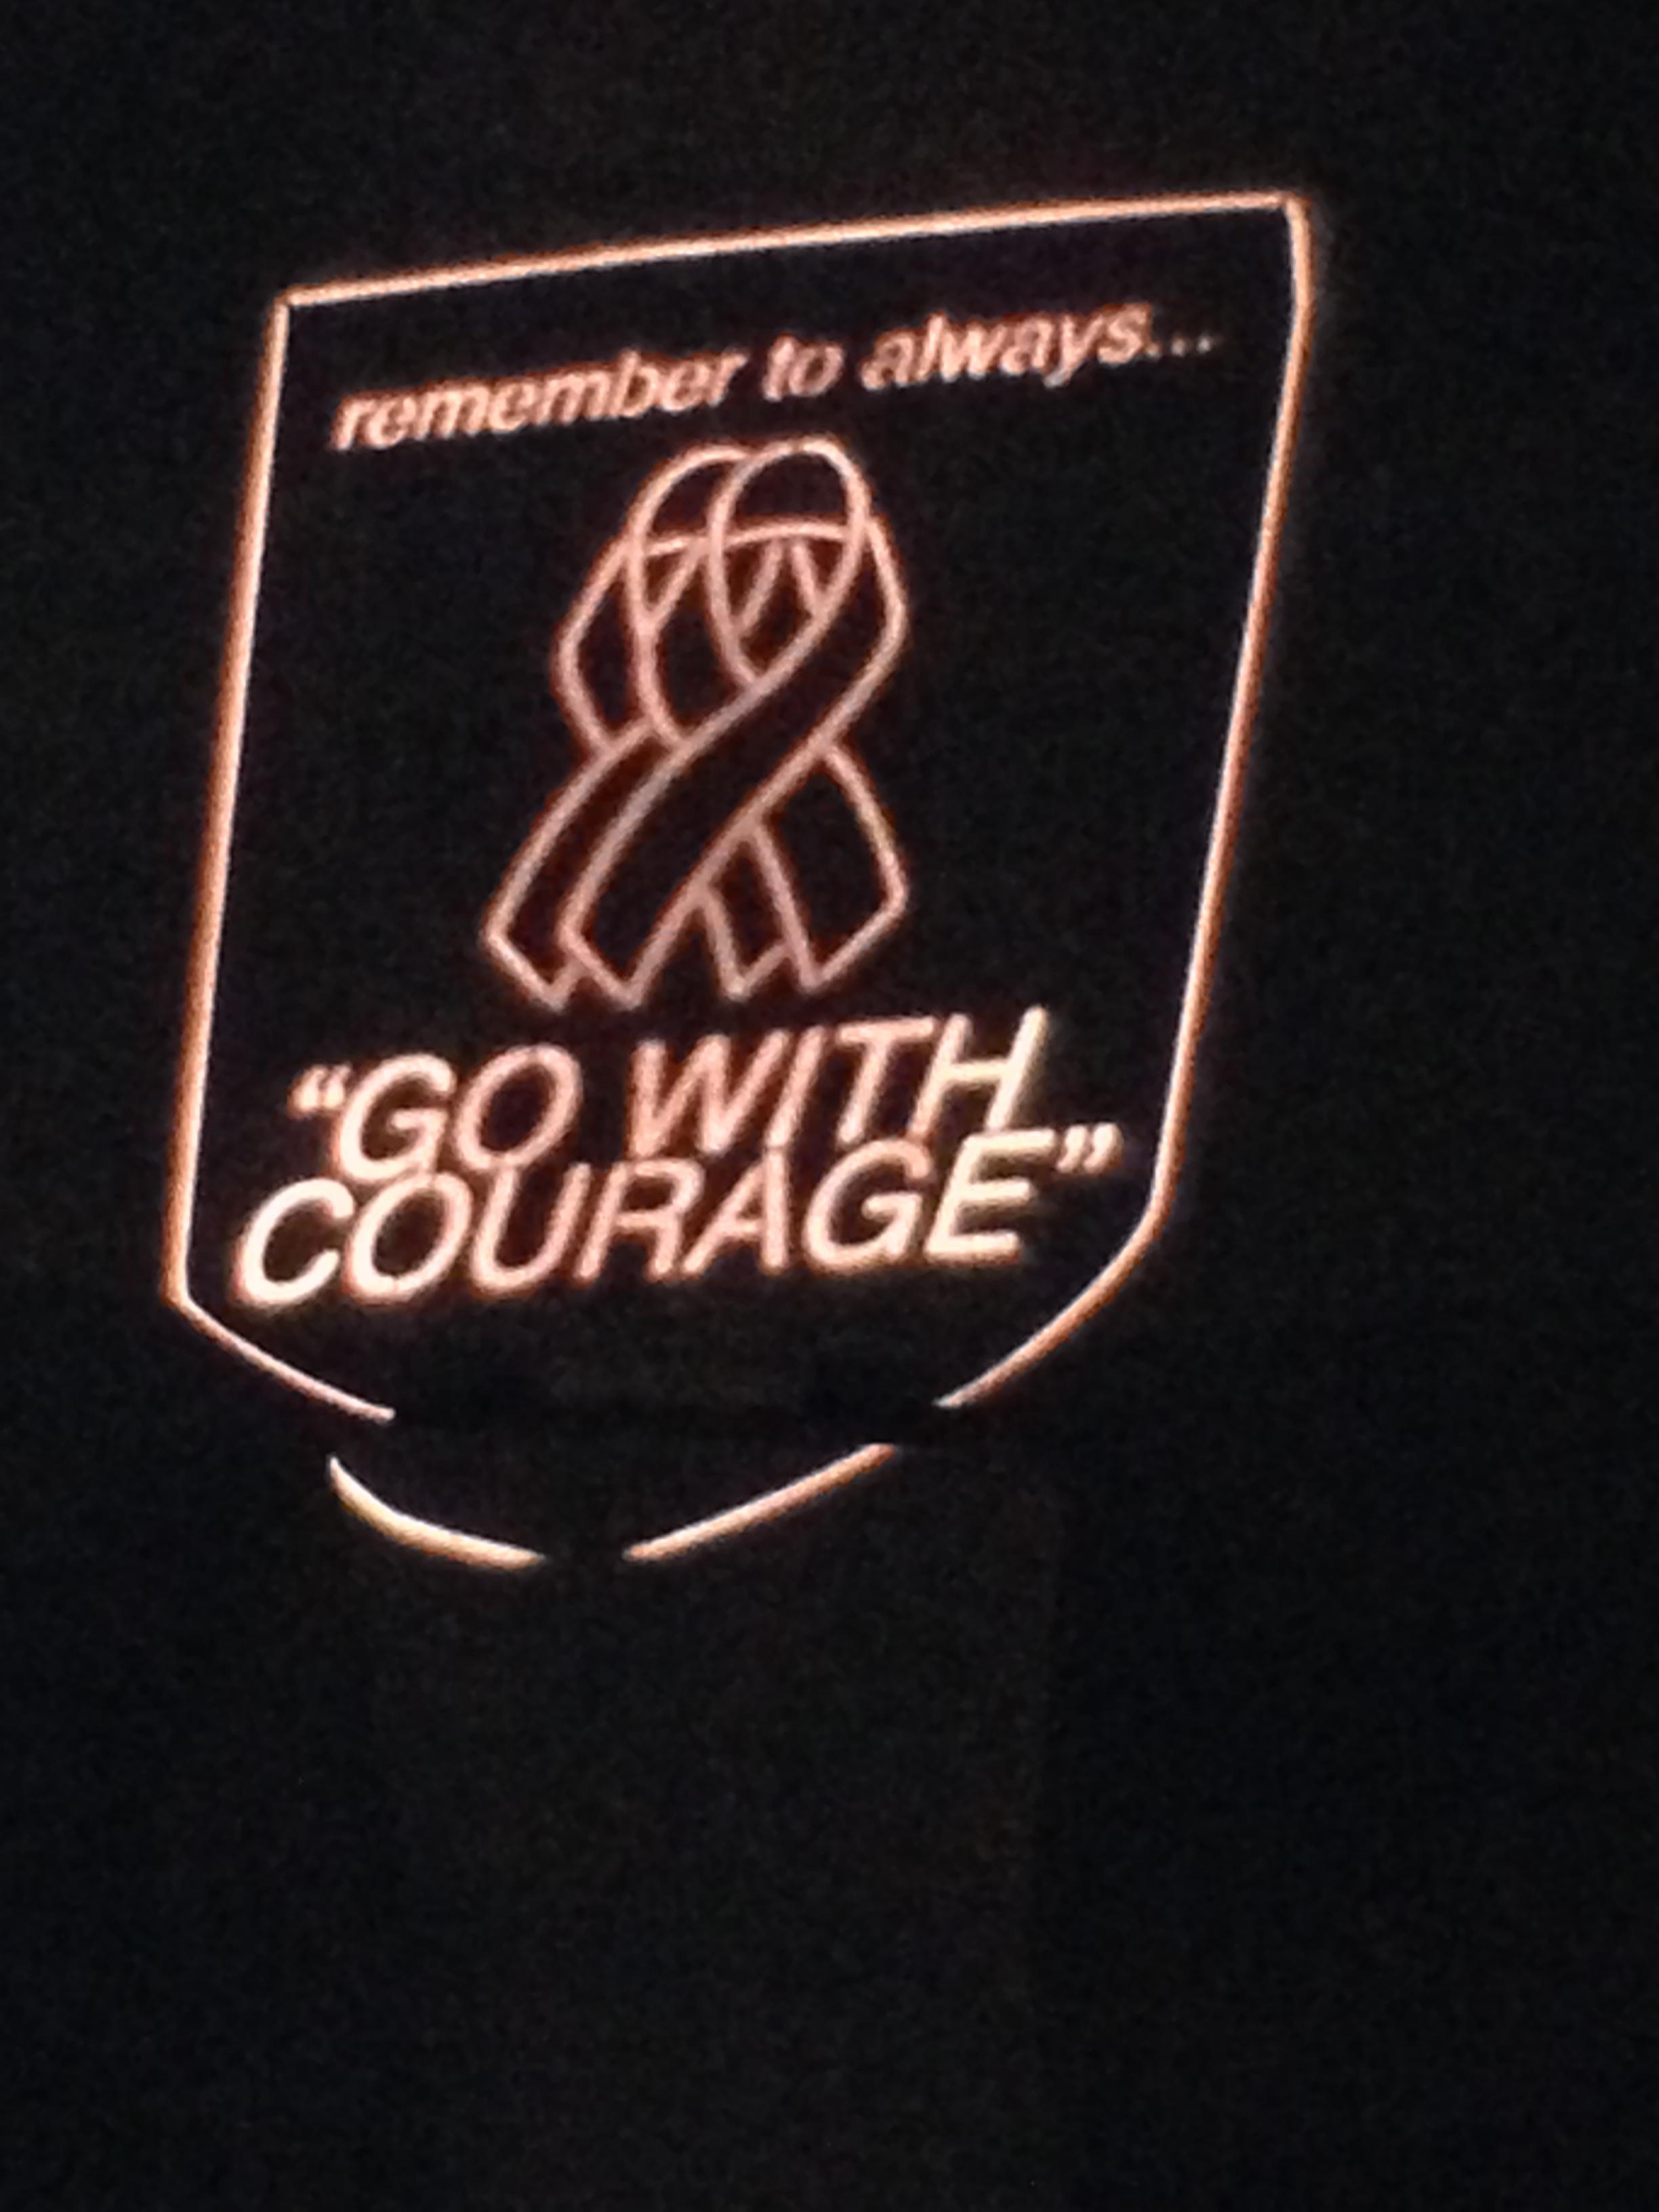 Illuminated Sign in the night sky at the 2014 Casino Night